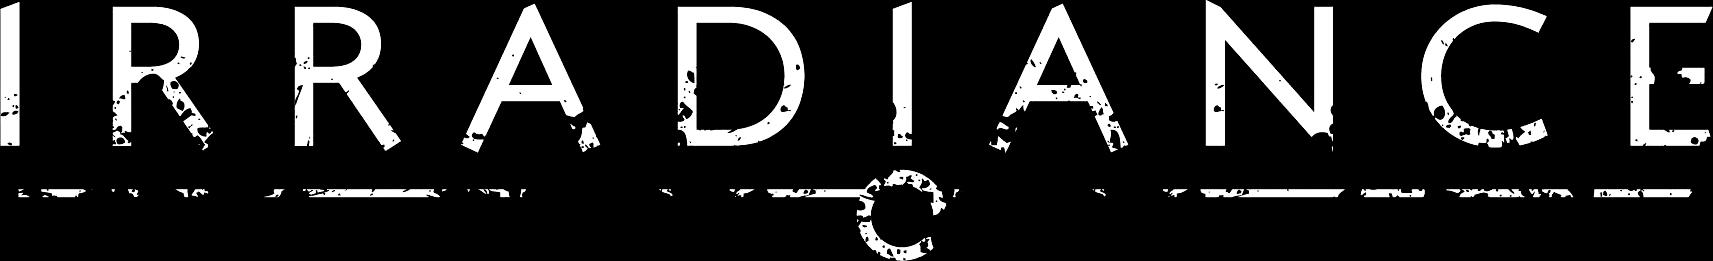 Irradiance - Logo